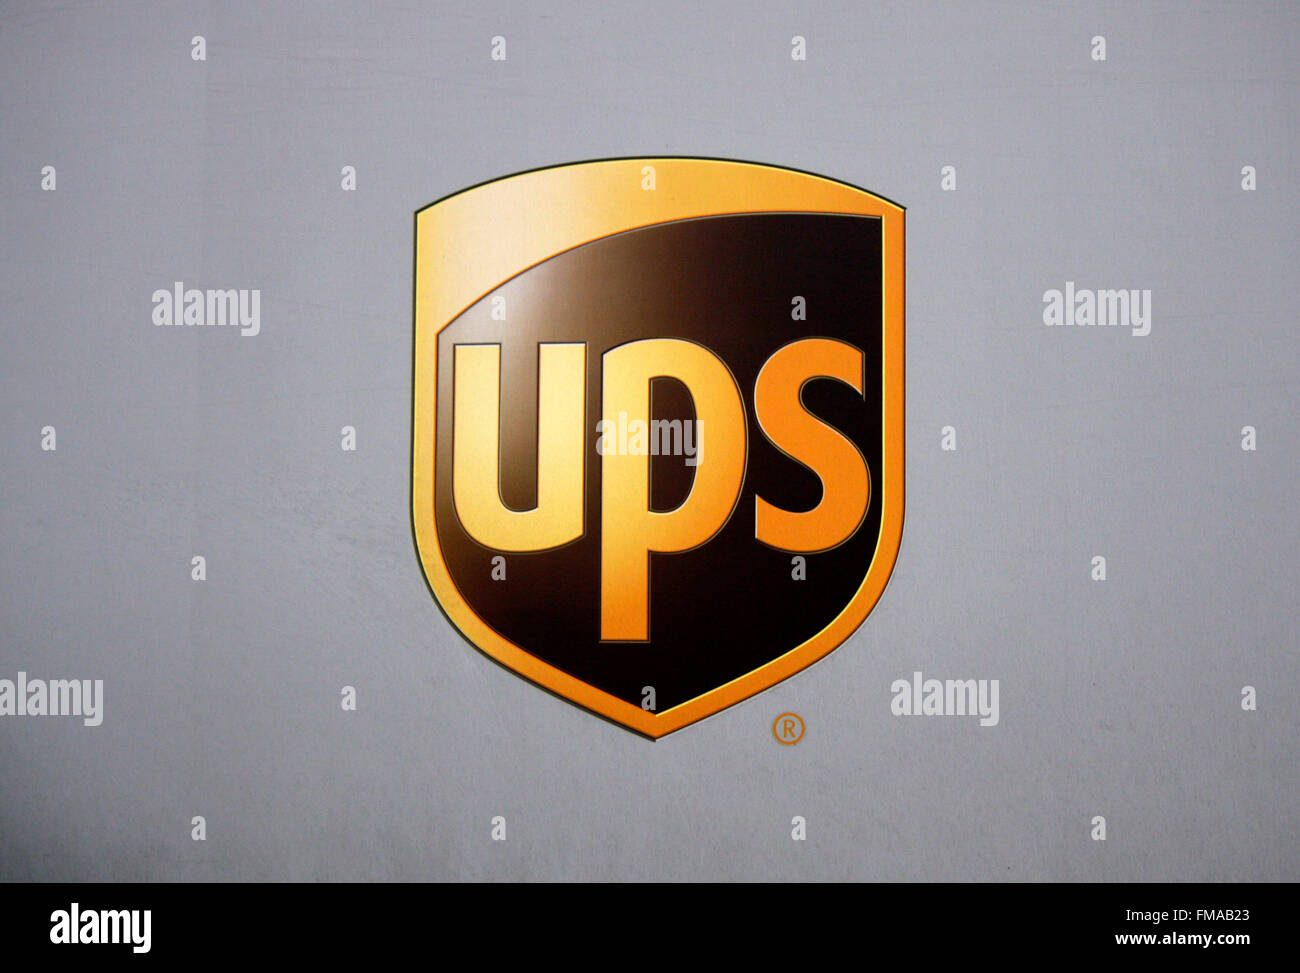 "Markenname: ""UPS - United Parcel Service"", Dezember 2013, Berlin. Stockbild"